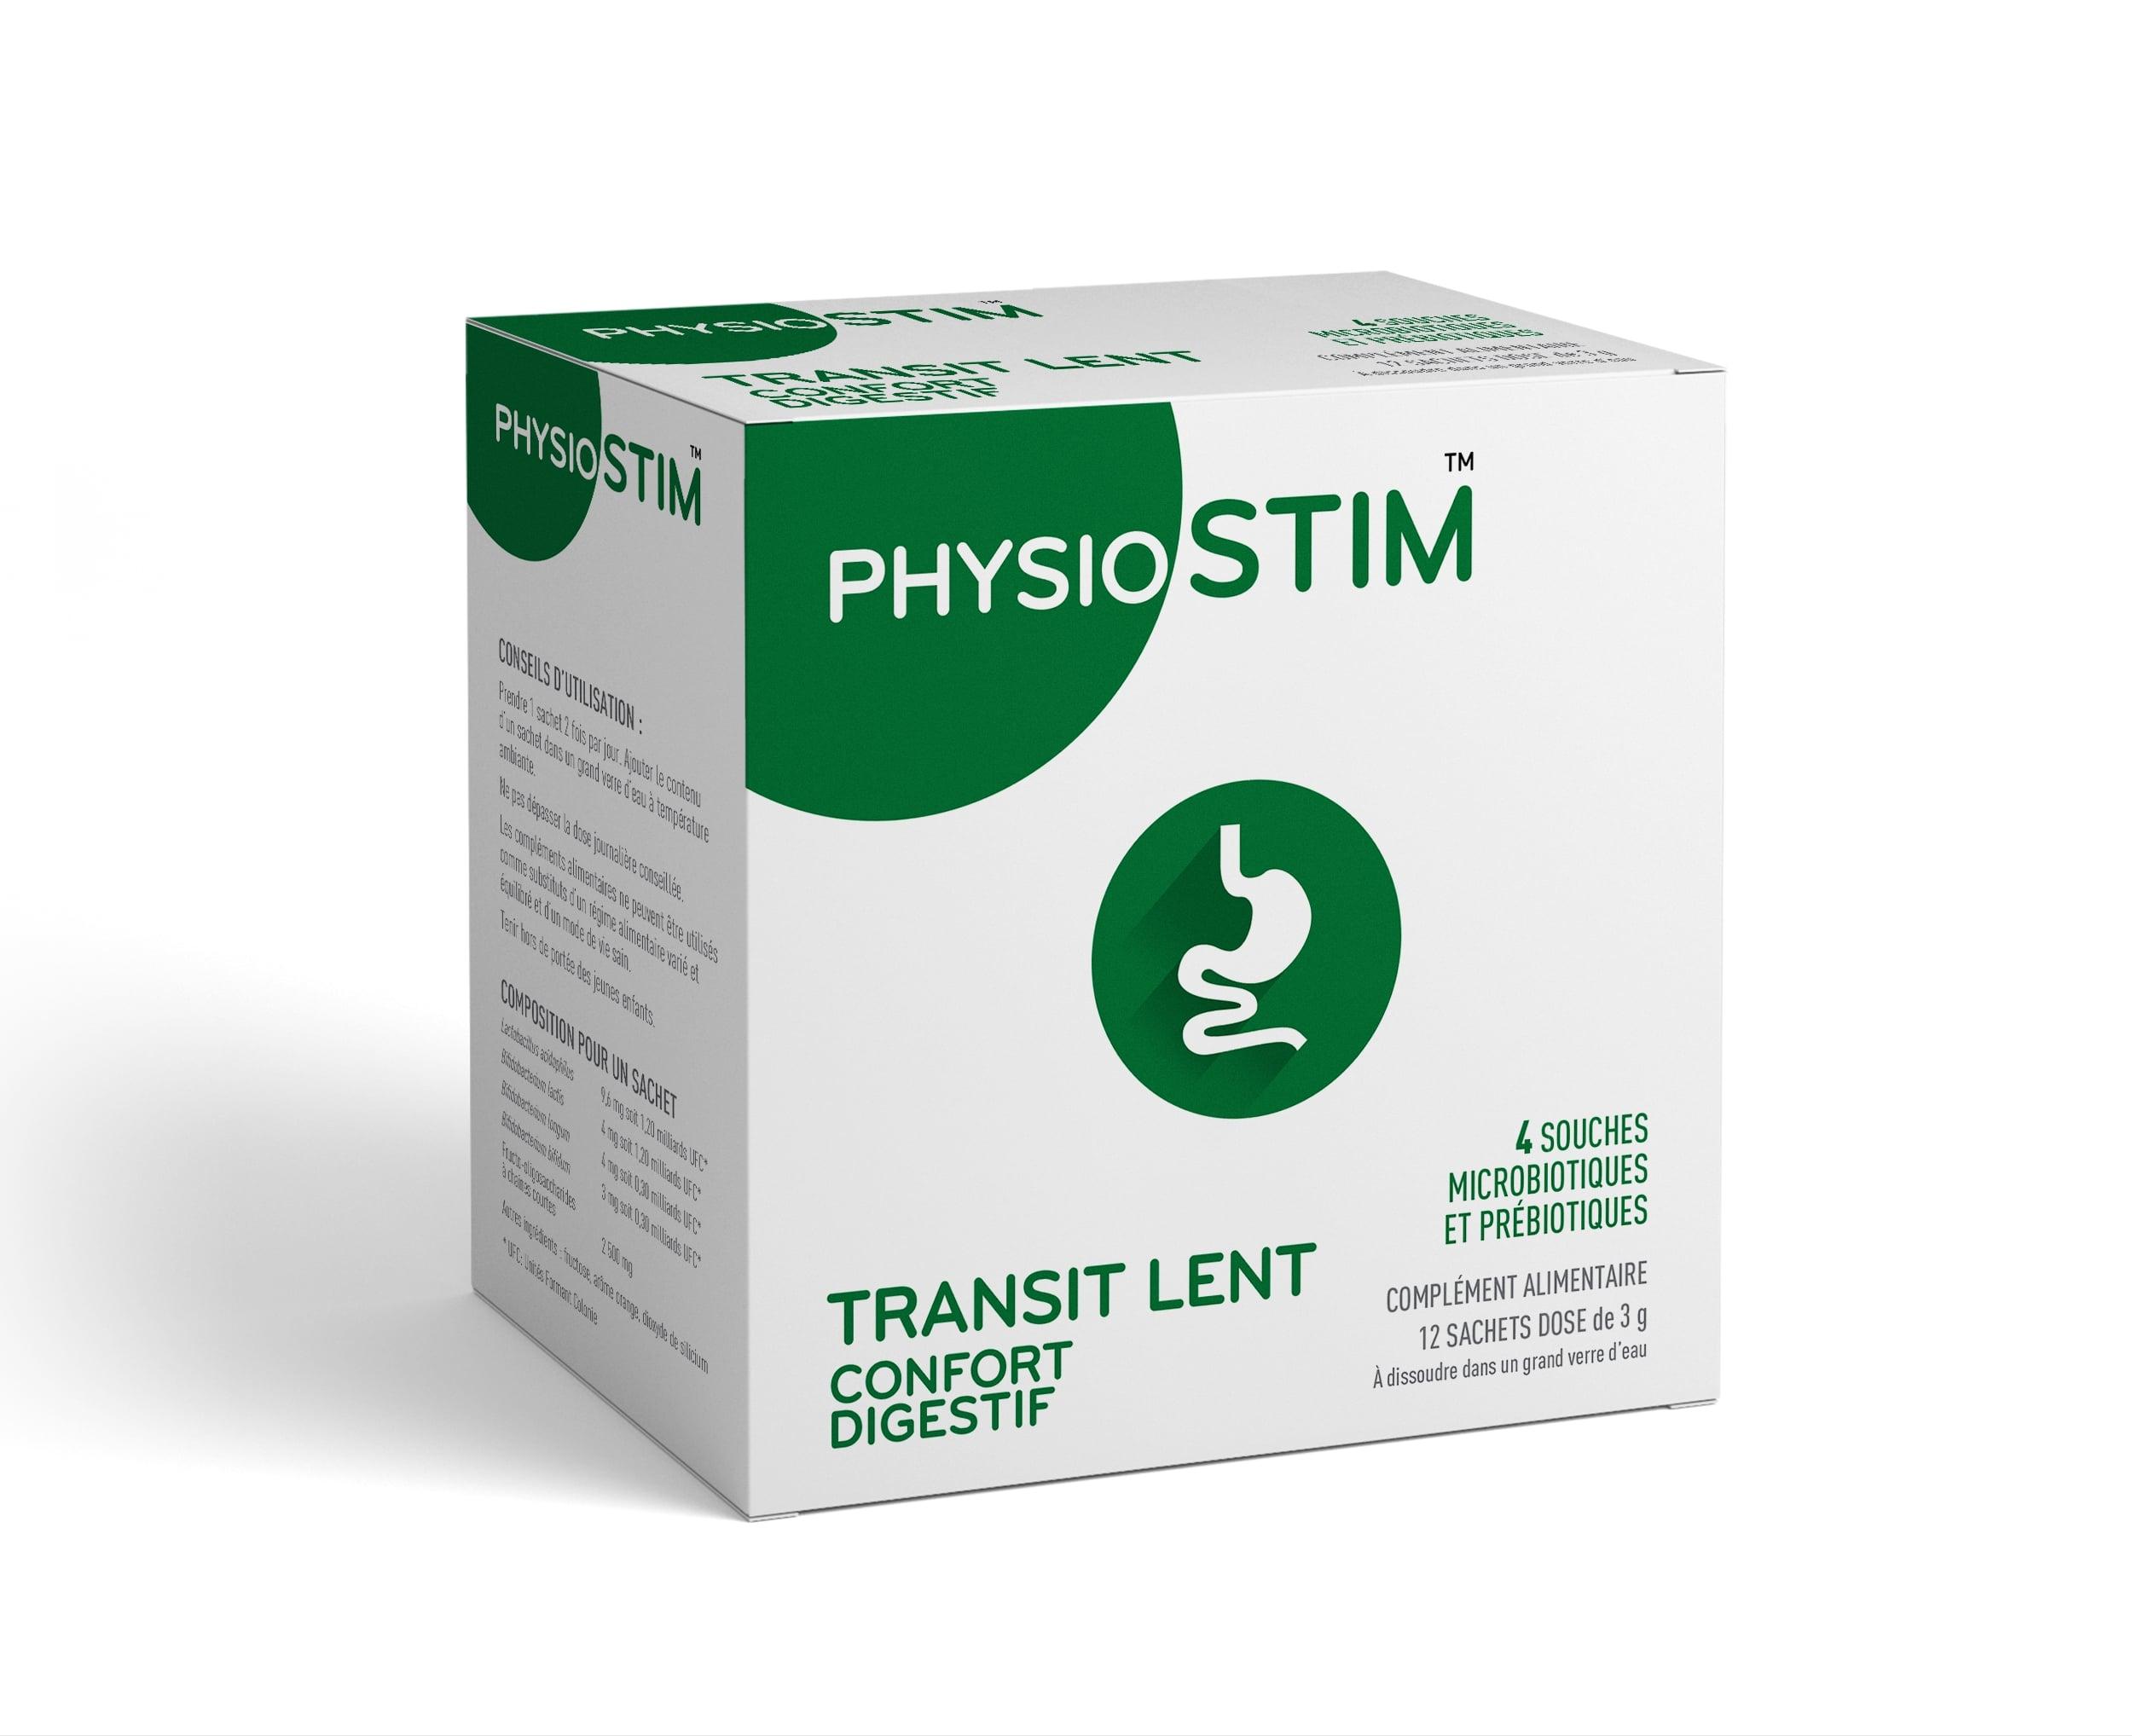 Laboratoire-Immubio-complement-alimentaire-PhysioSTIM-TL